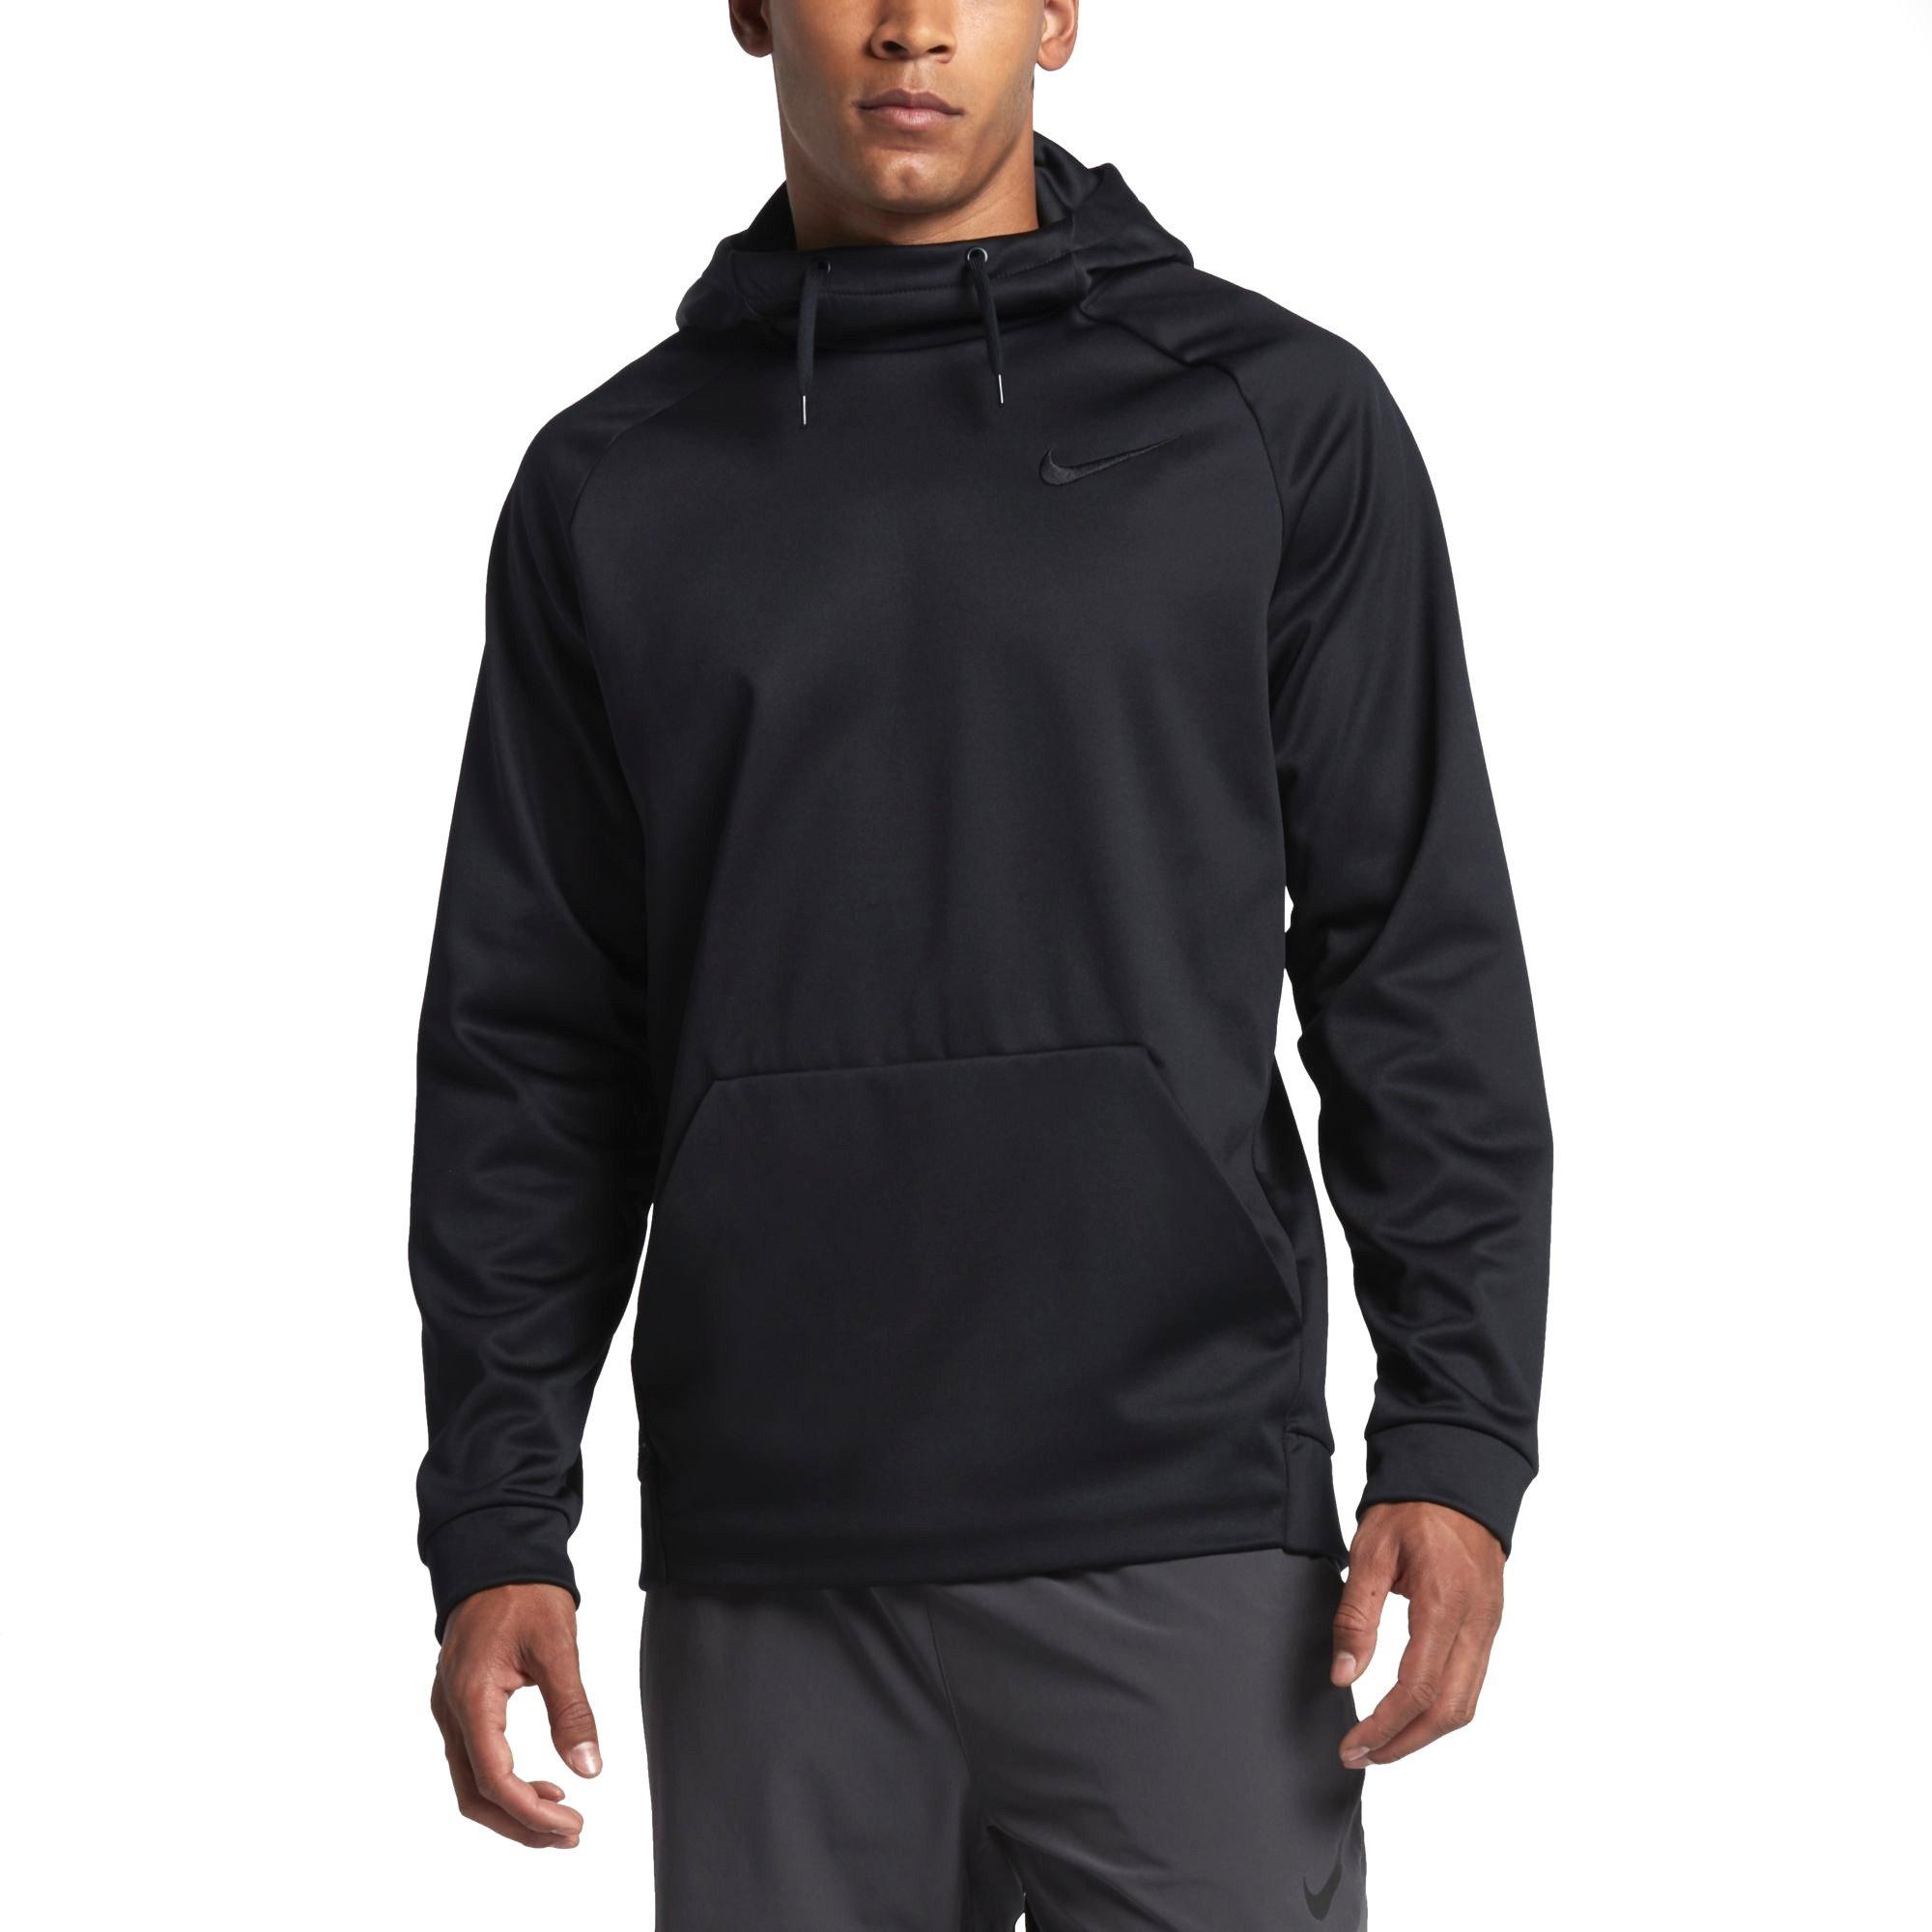 Nike Men's Therma Training Hoodie (Black/Dark Grey, 2X Tall) by Nike